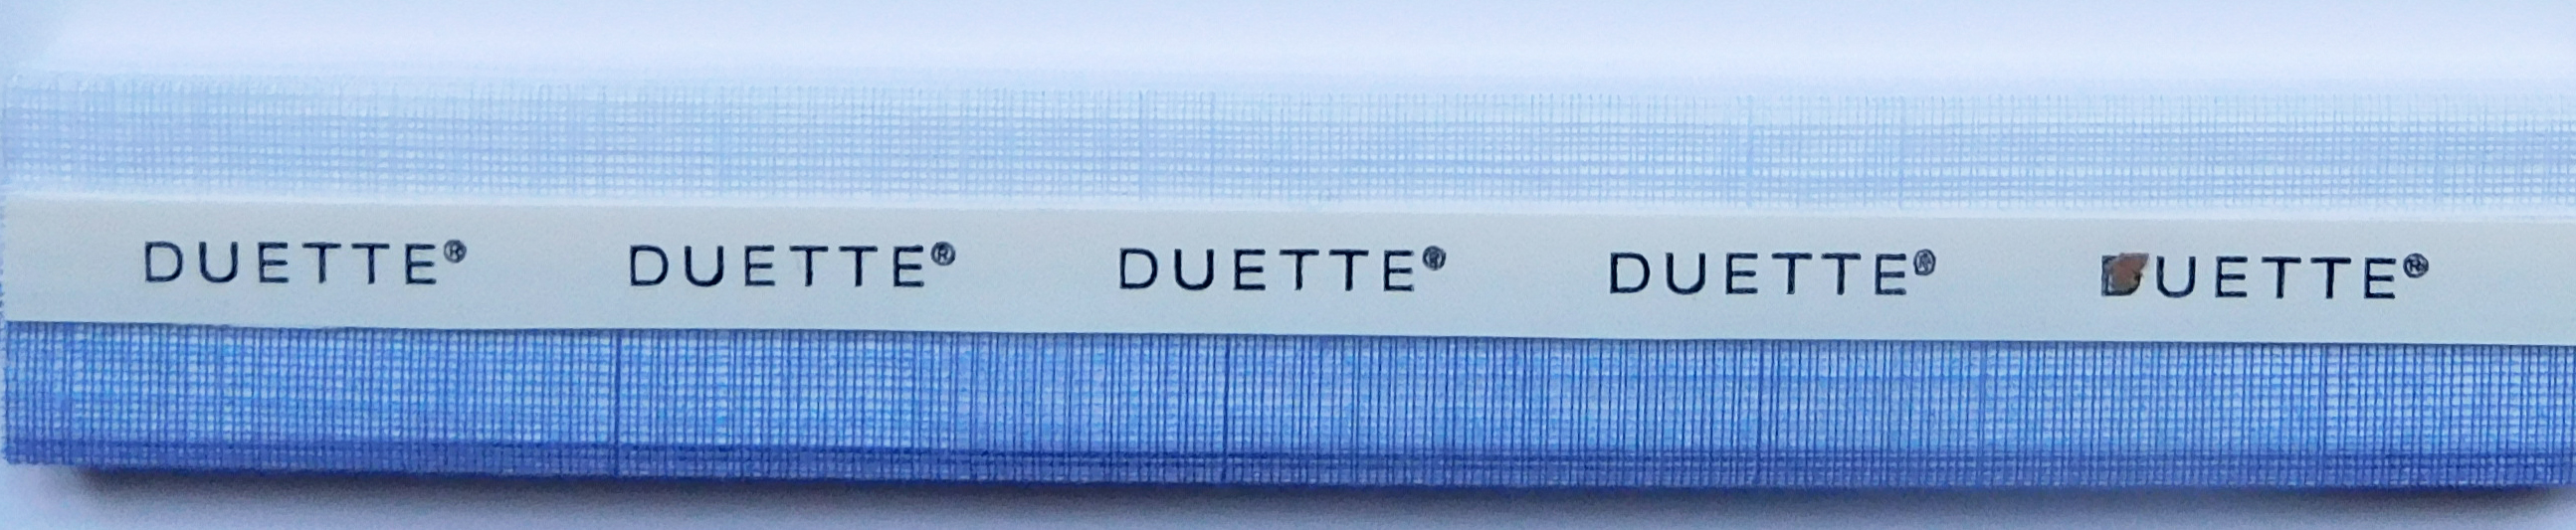 Batiste Sheer Mountain Lake Duette Blind fabric sample